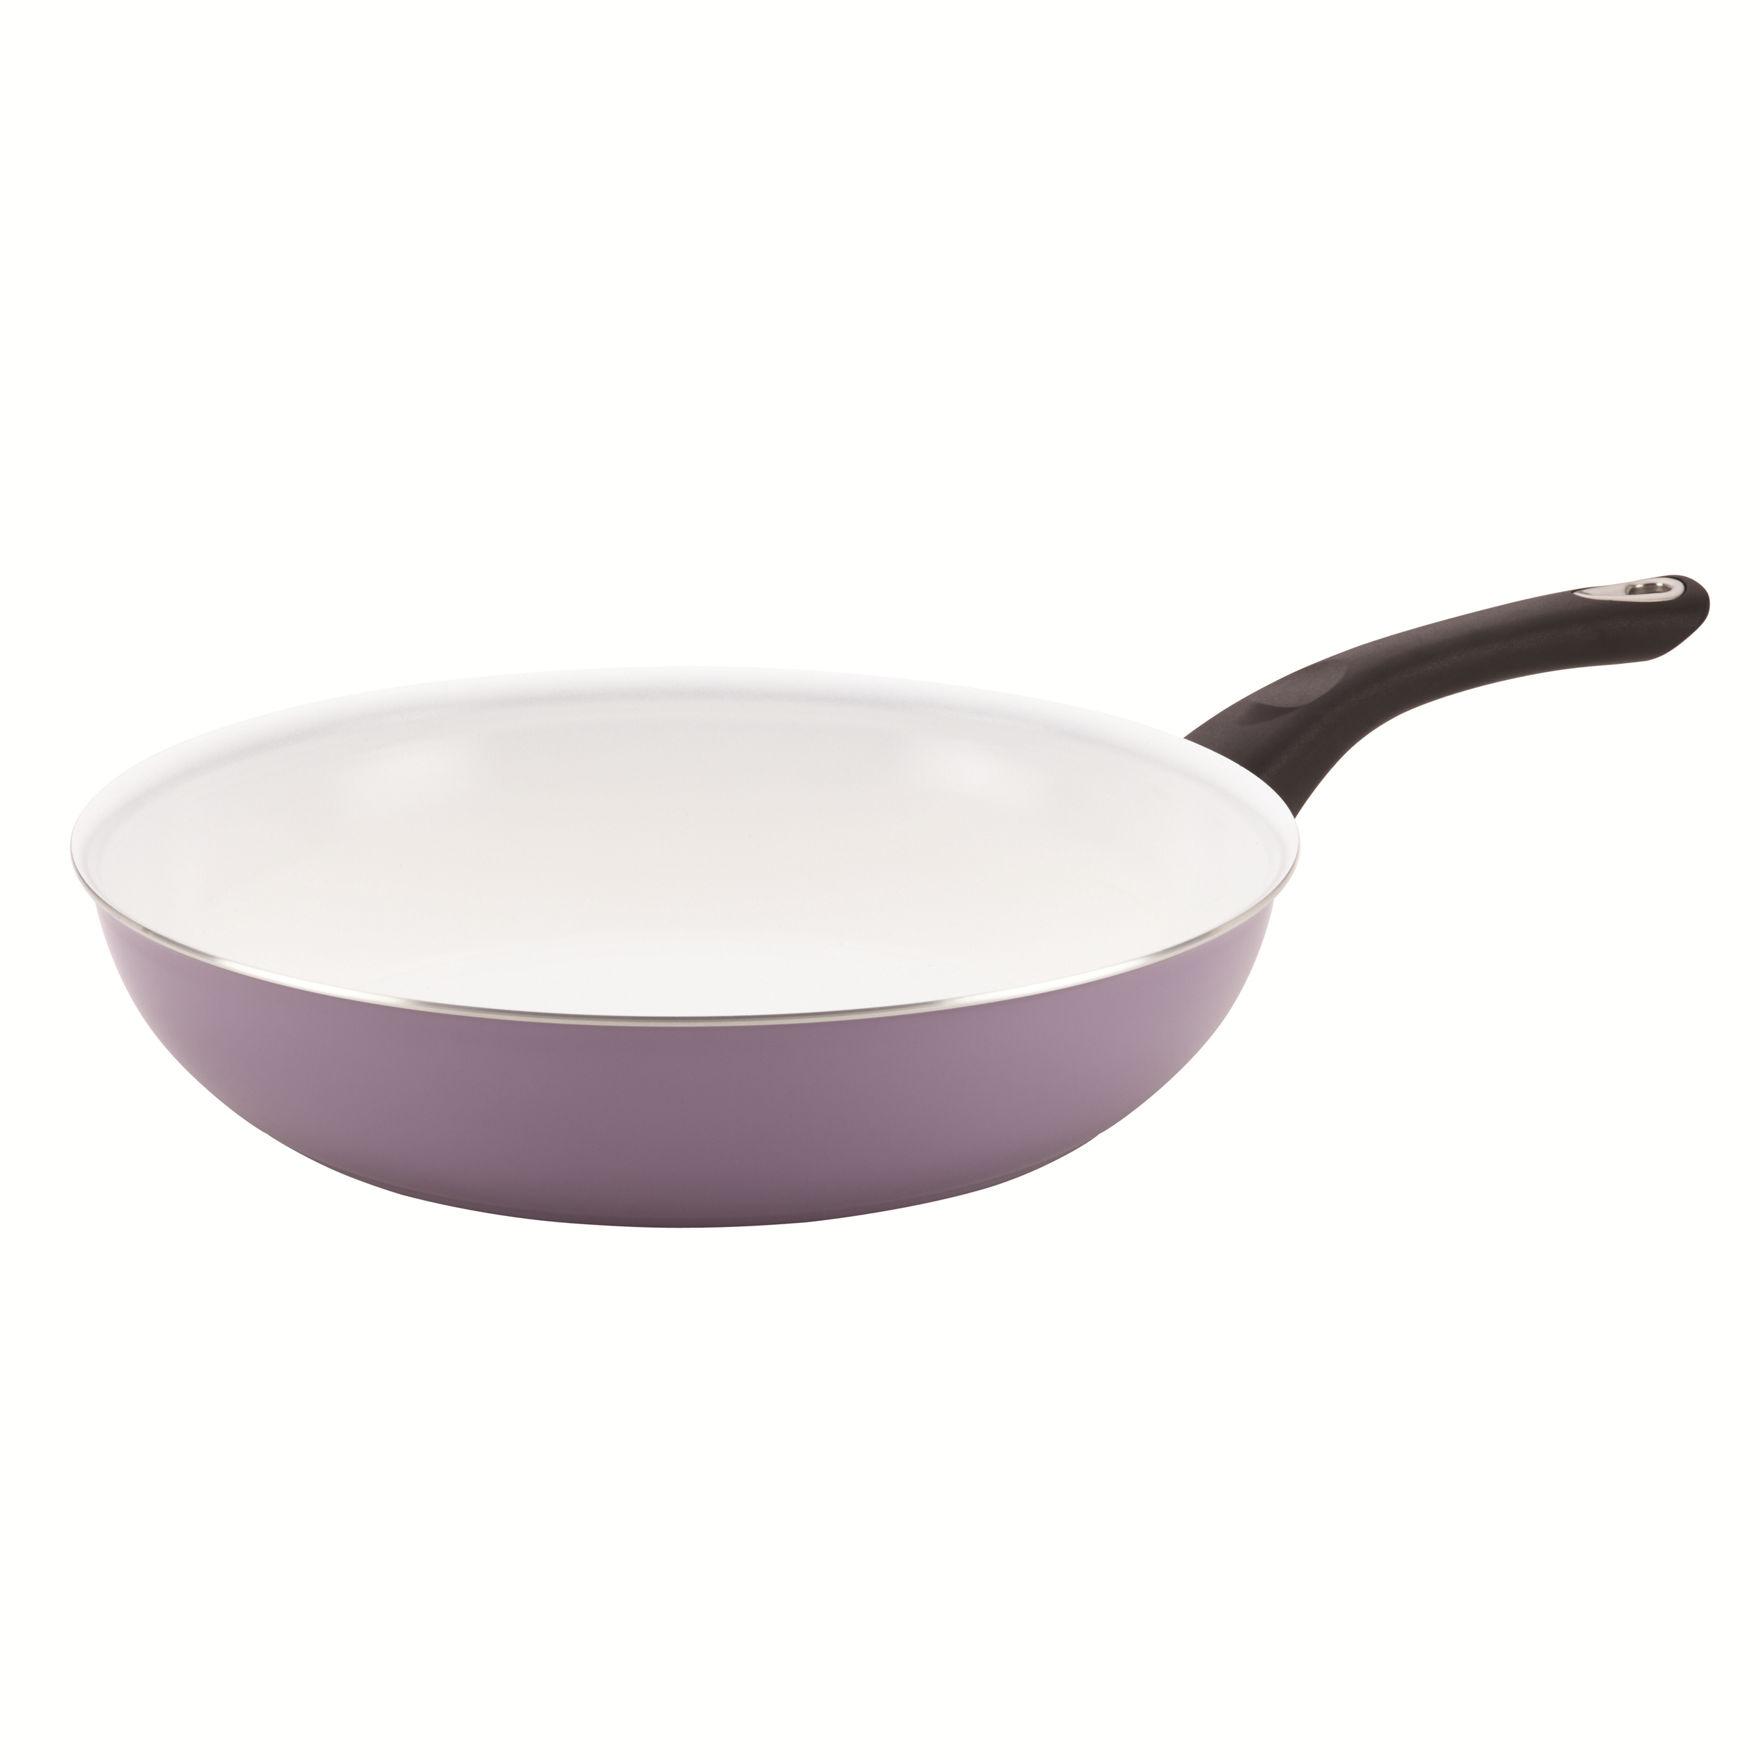 Farberware Lavender Frying Pans & Skillets Cookware